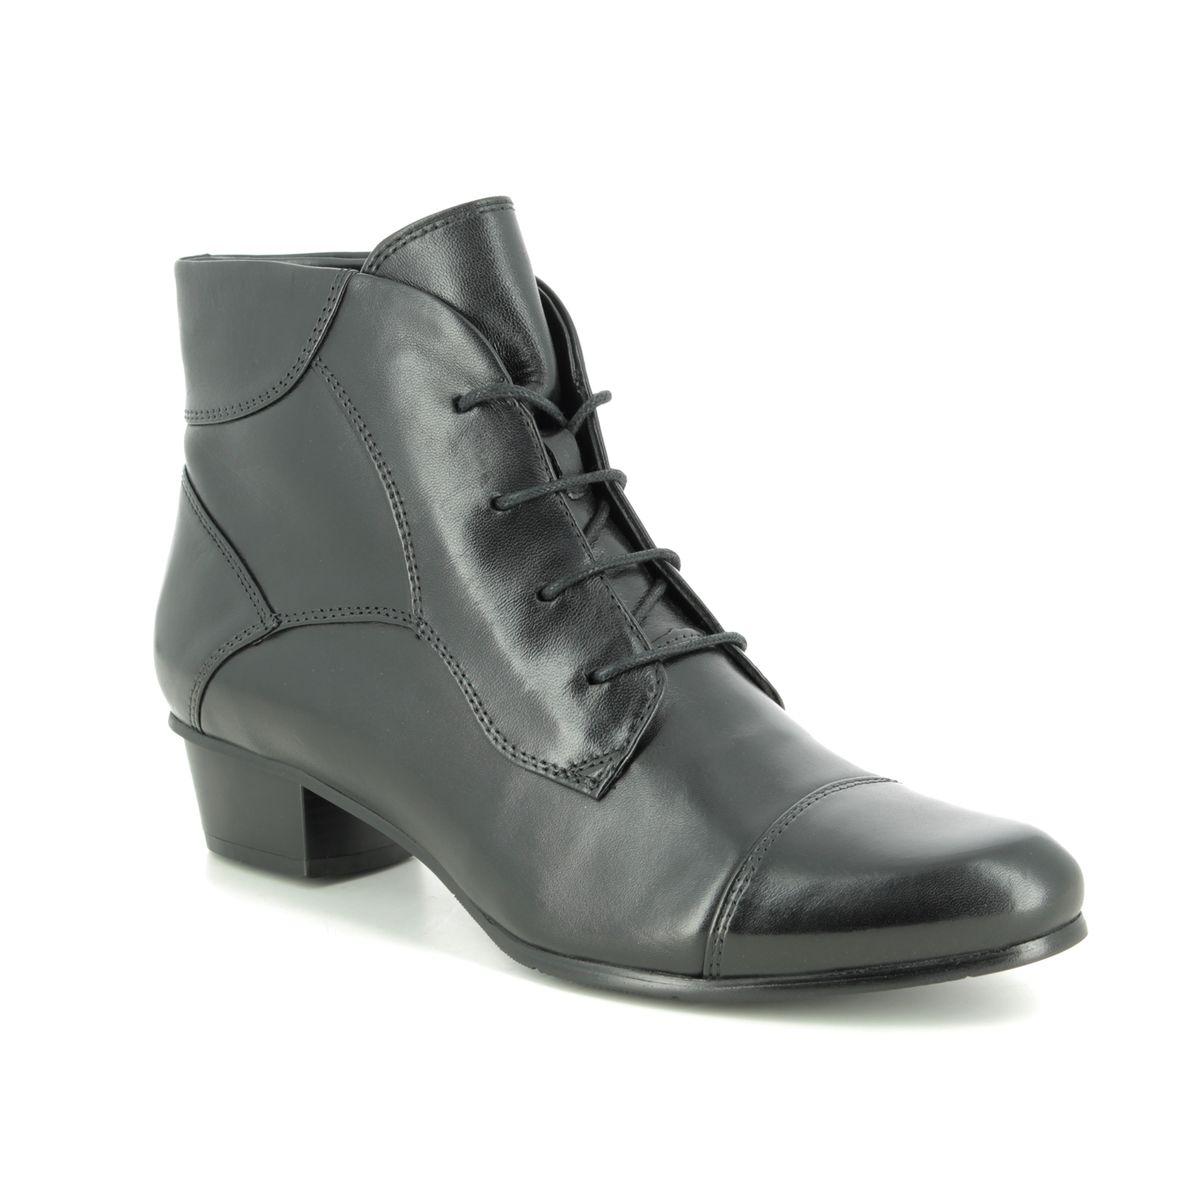 Stefany 123 Schuhe Le Regarde Ciel Damen hQCrdstx